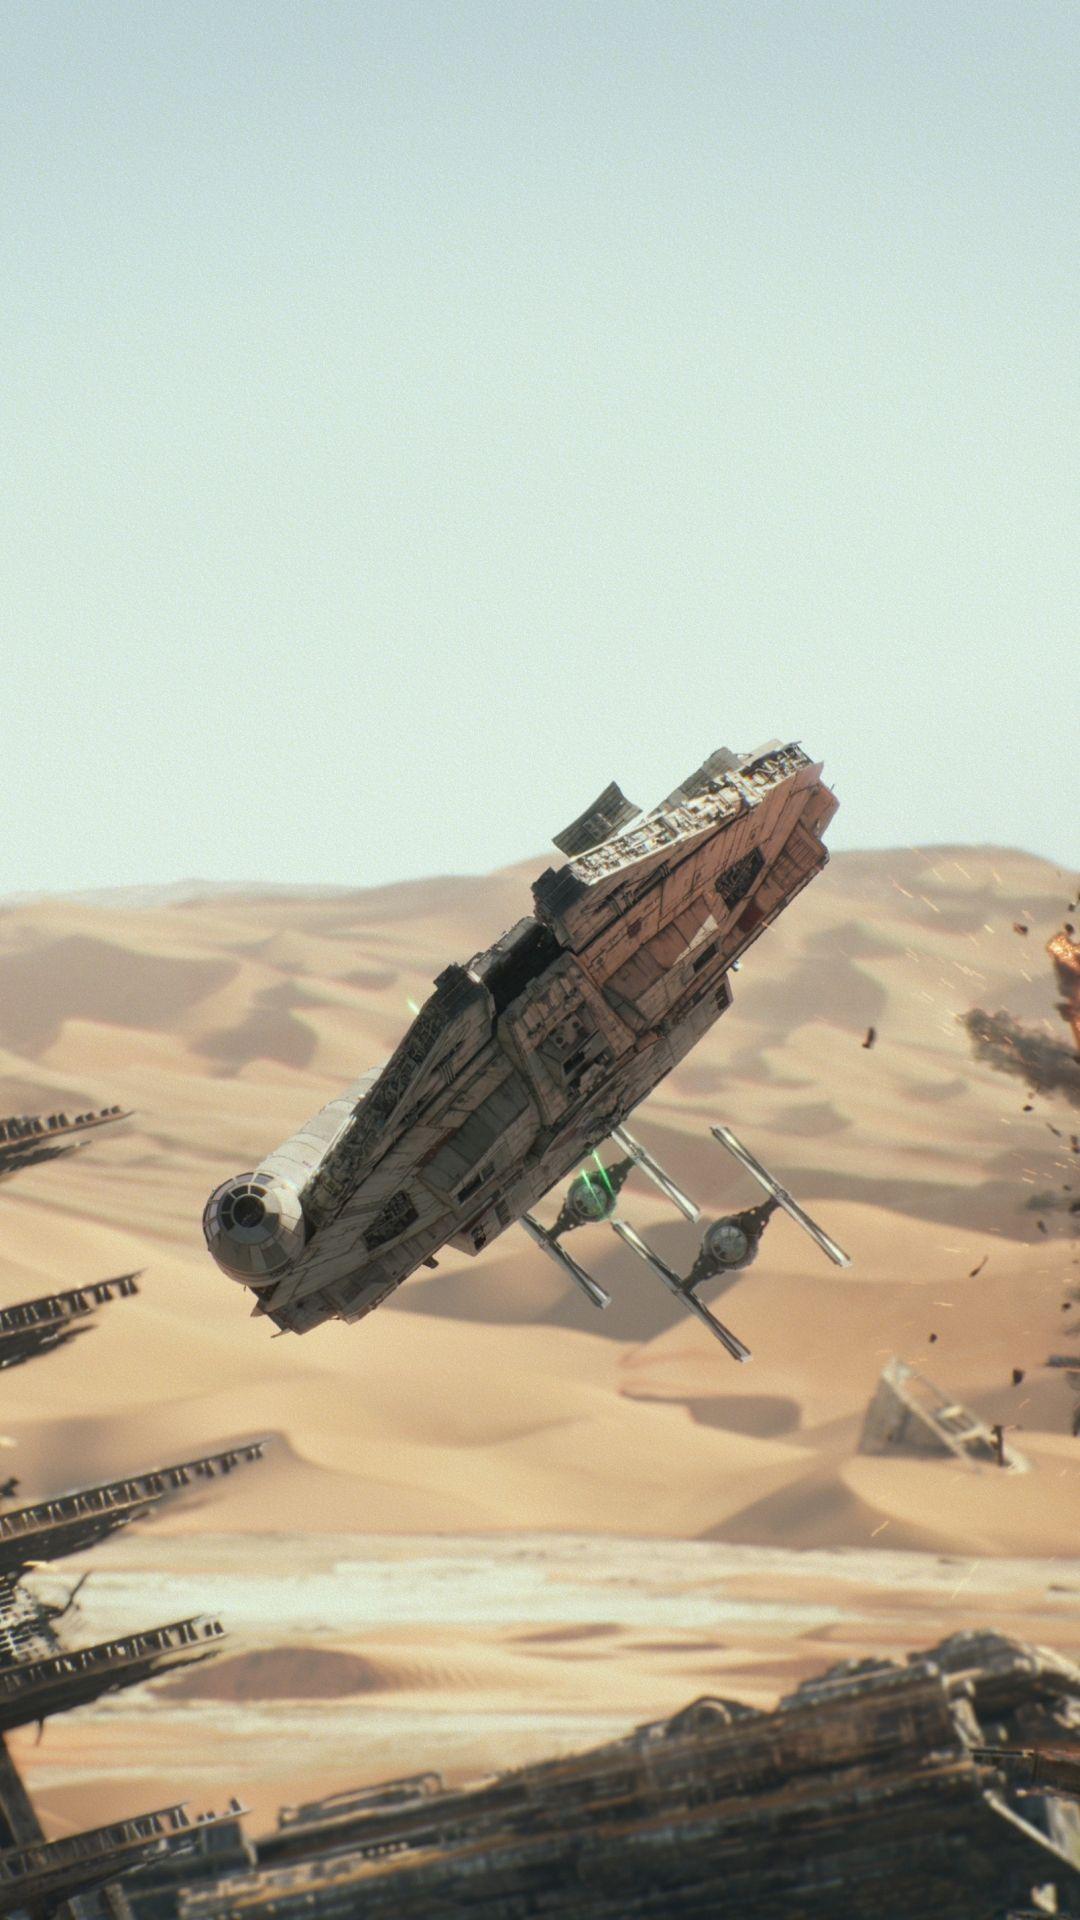 600867 Jpg 1080 1920 Star Wars Ships Star Wars Wallpaper Star Wars Poster